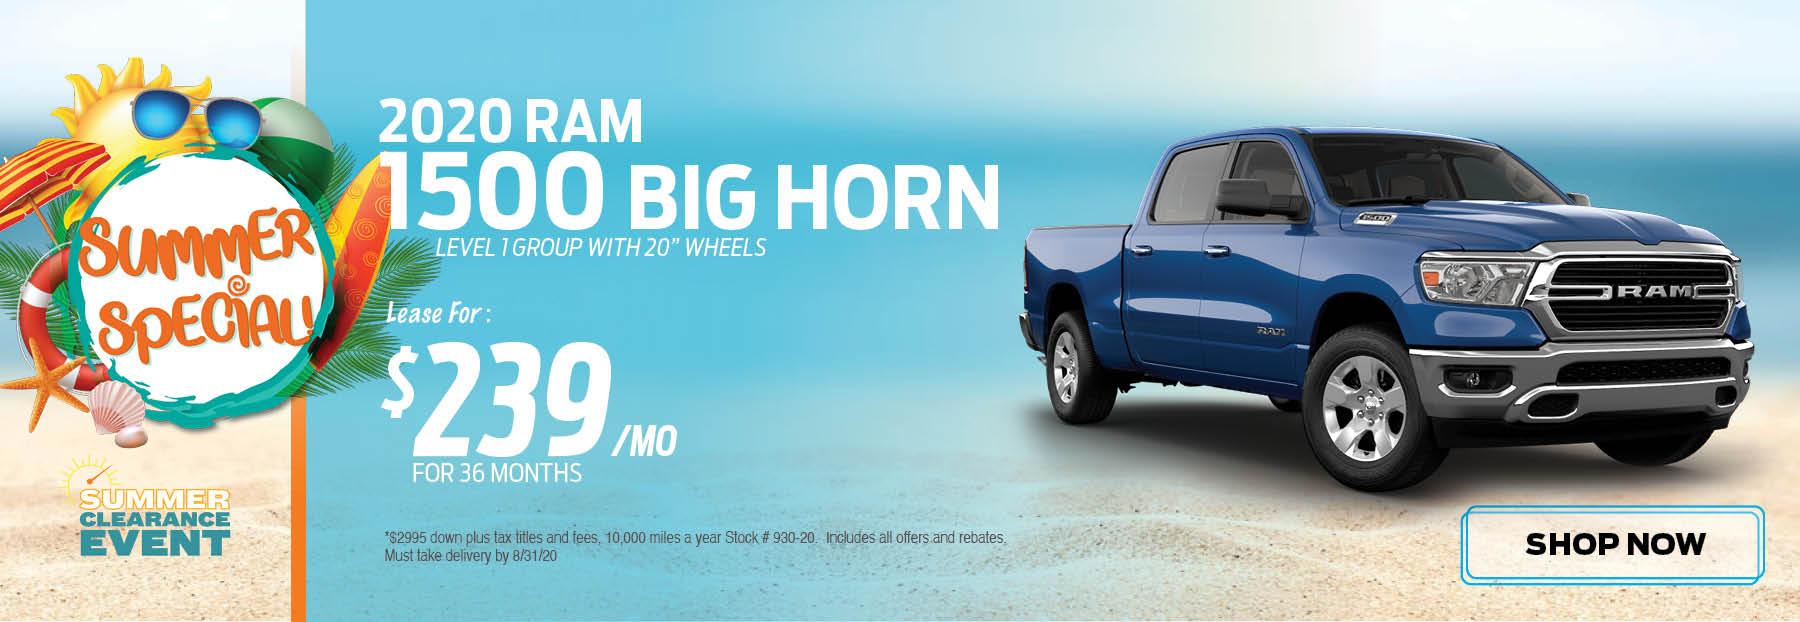 2020 RAM 1500 Special